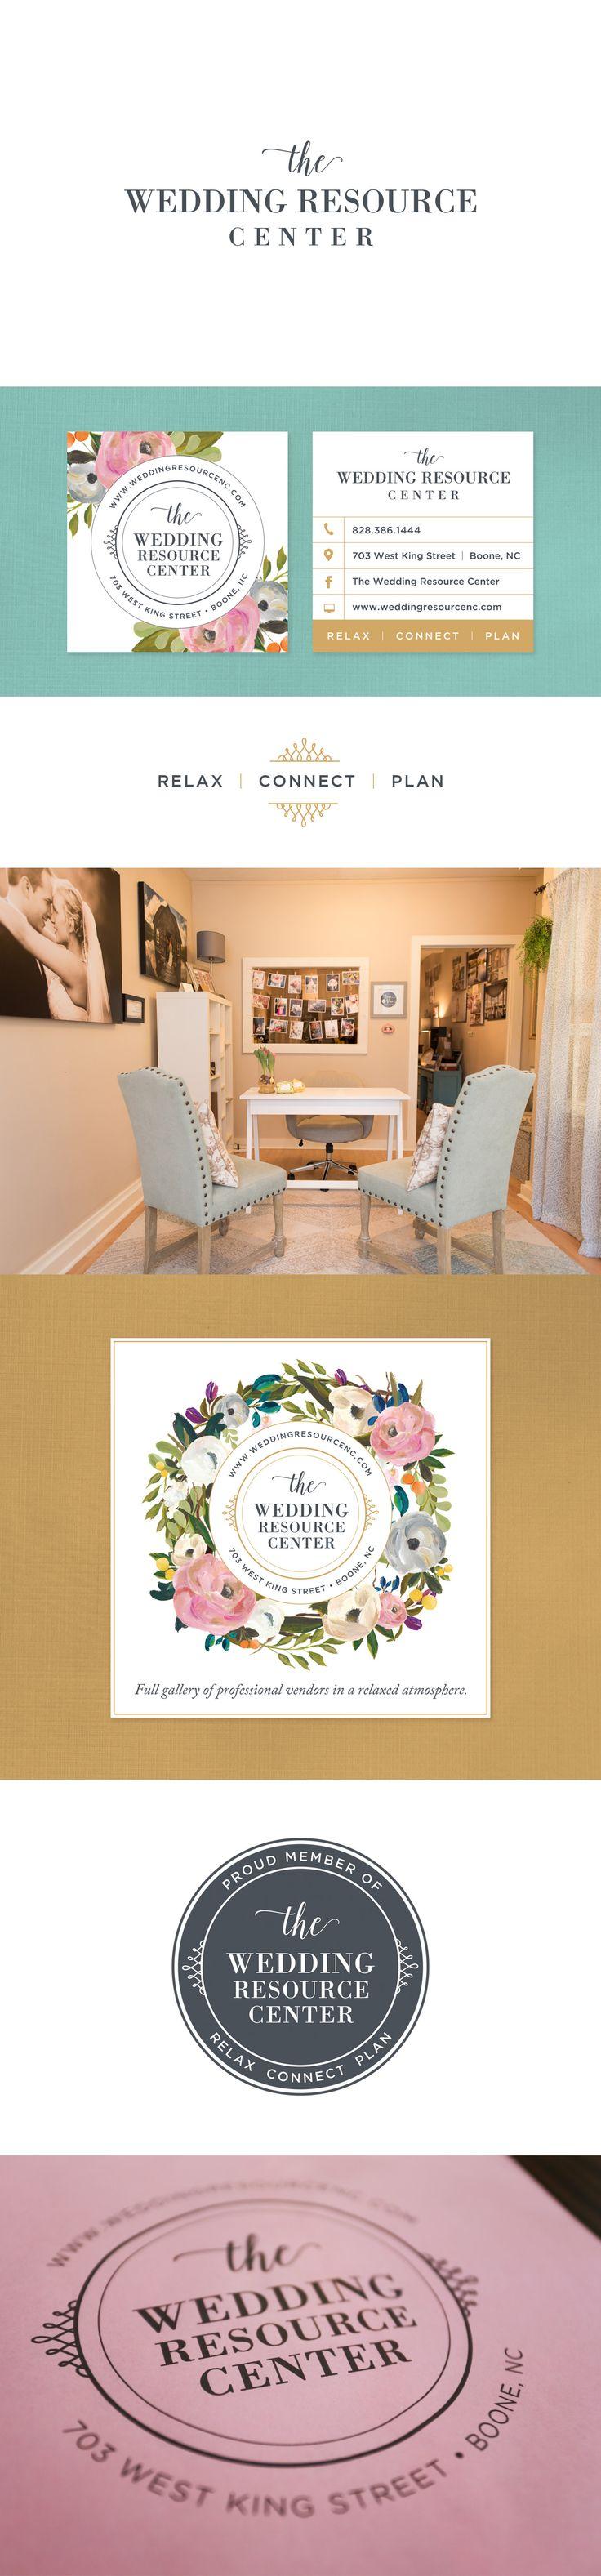 The Wedding Resource Center ~ Branding & Design by Snow in July Designs #logodesign #branding